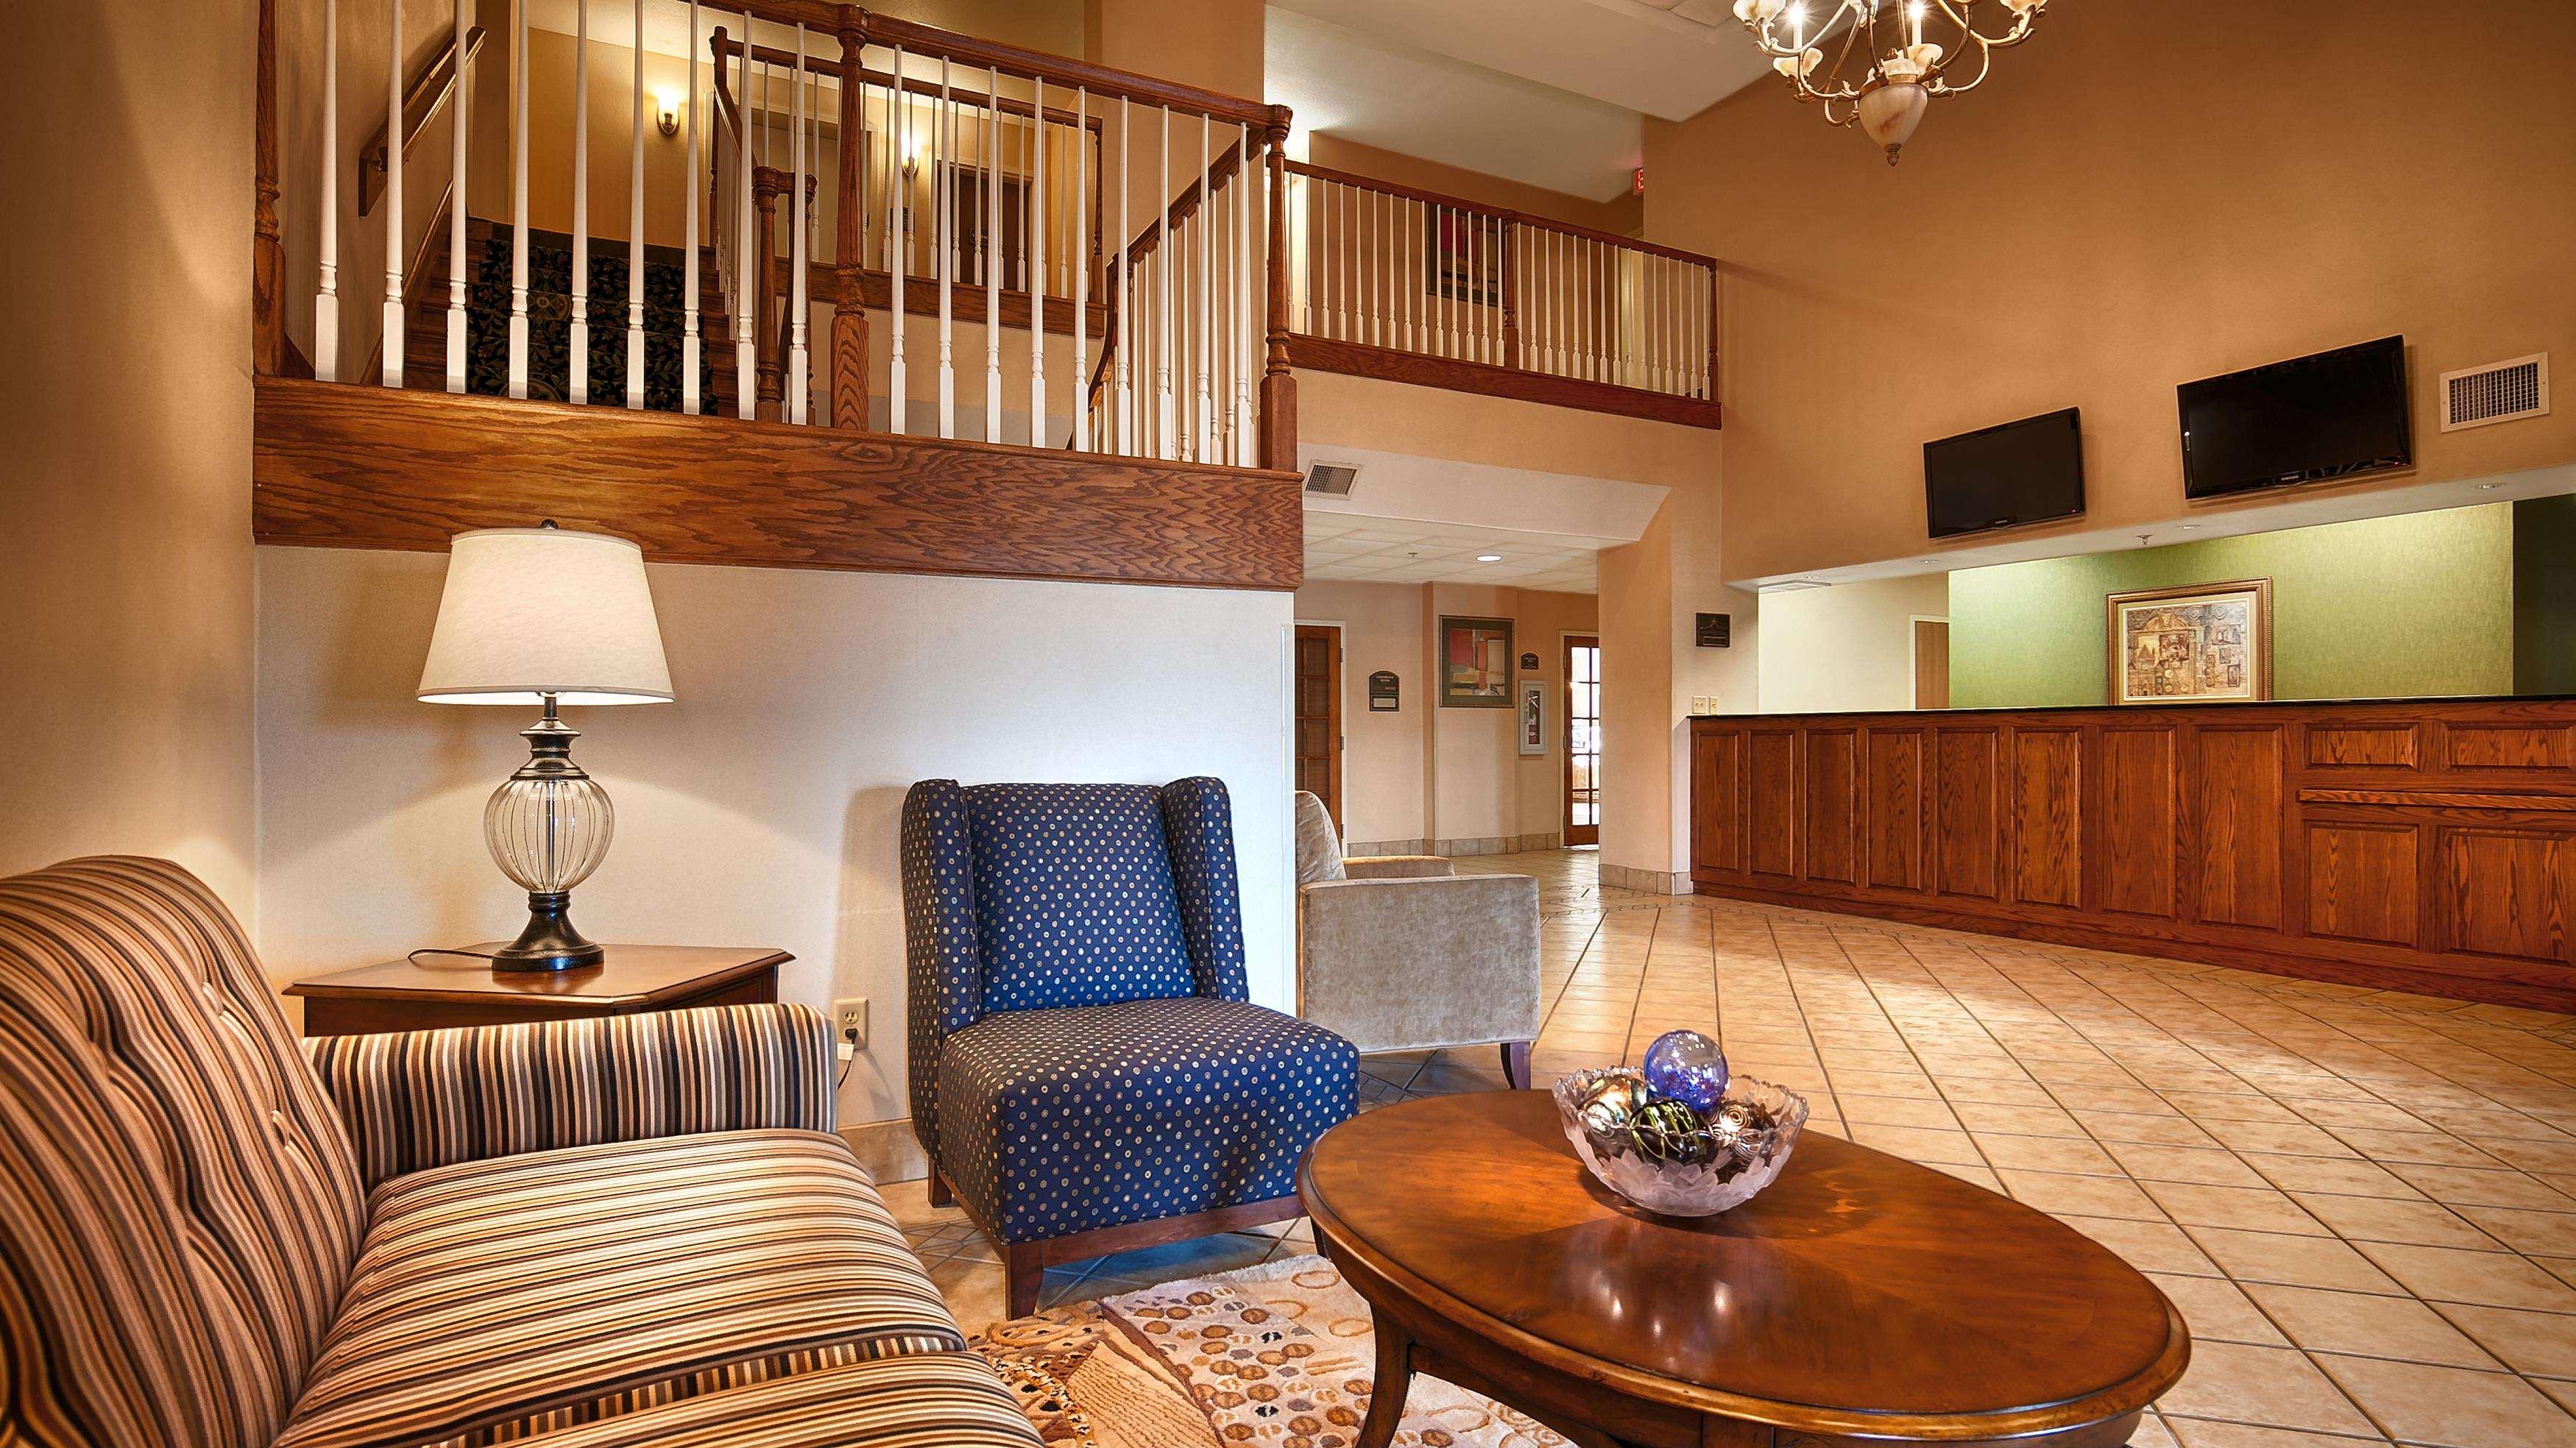 Best Western Plus Executive Hotel & Suites image 19